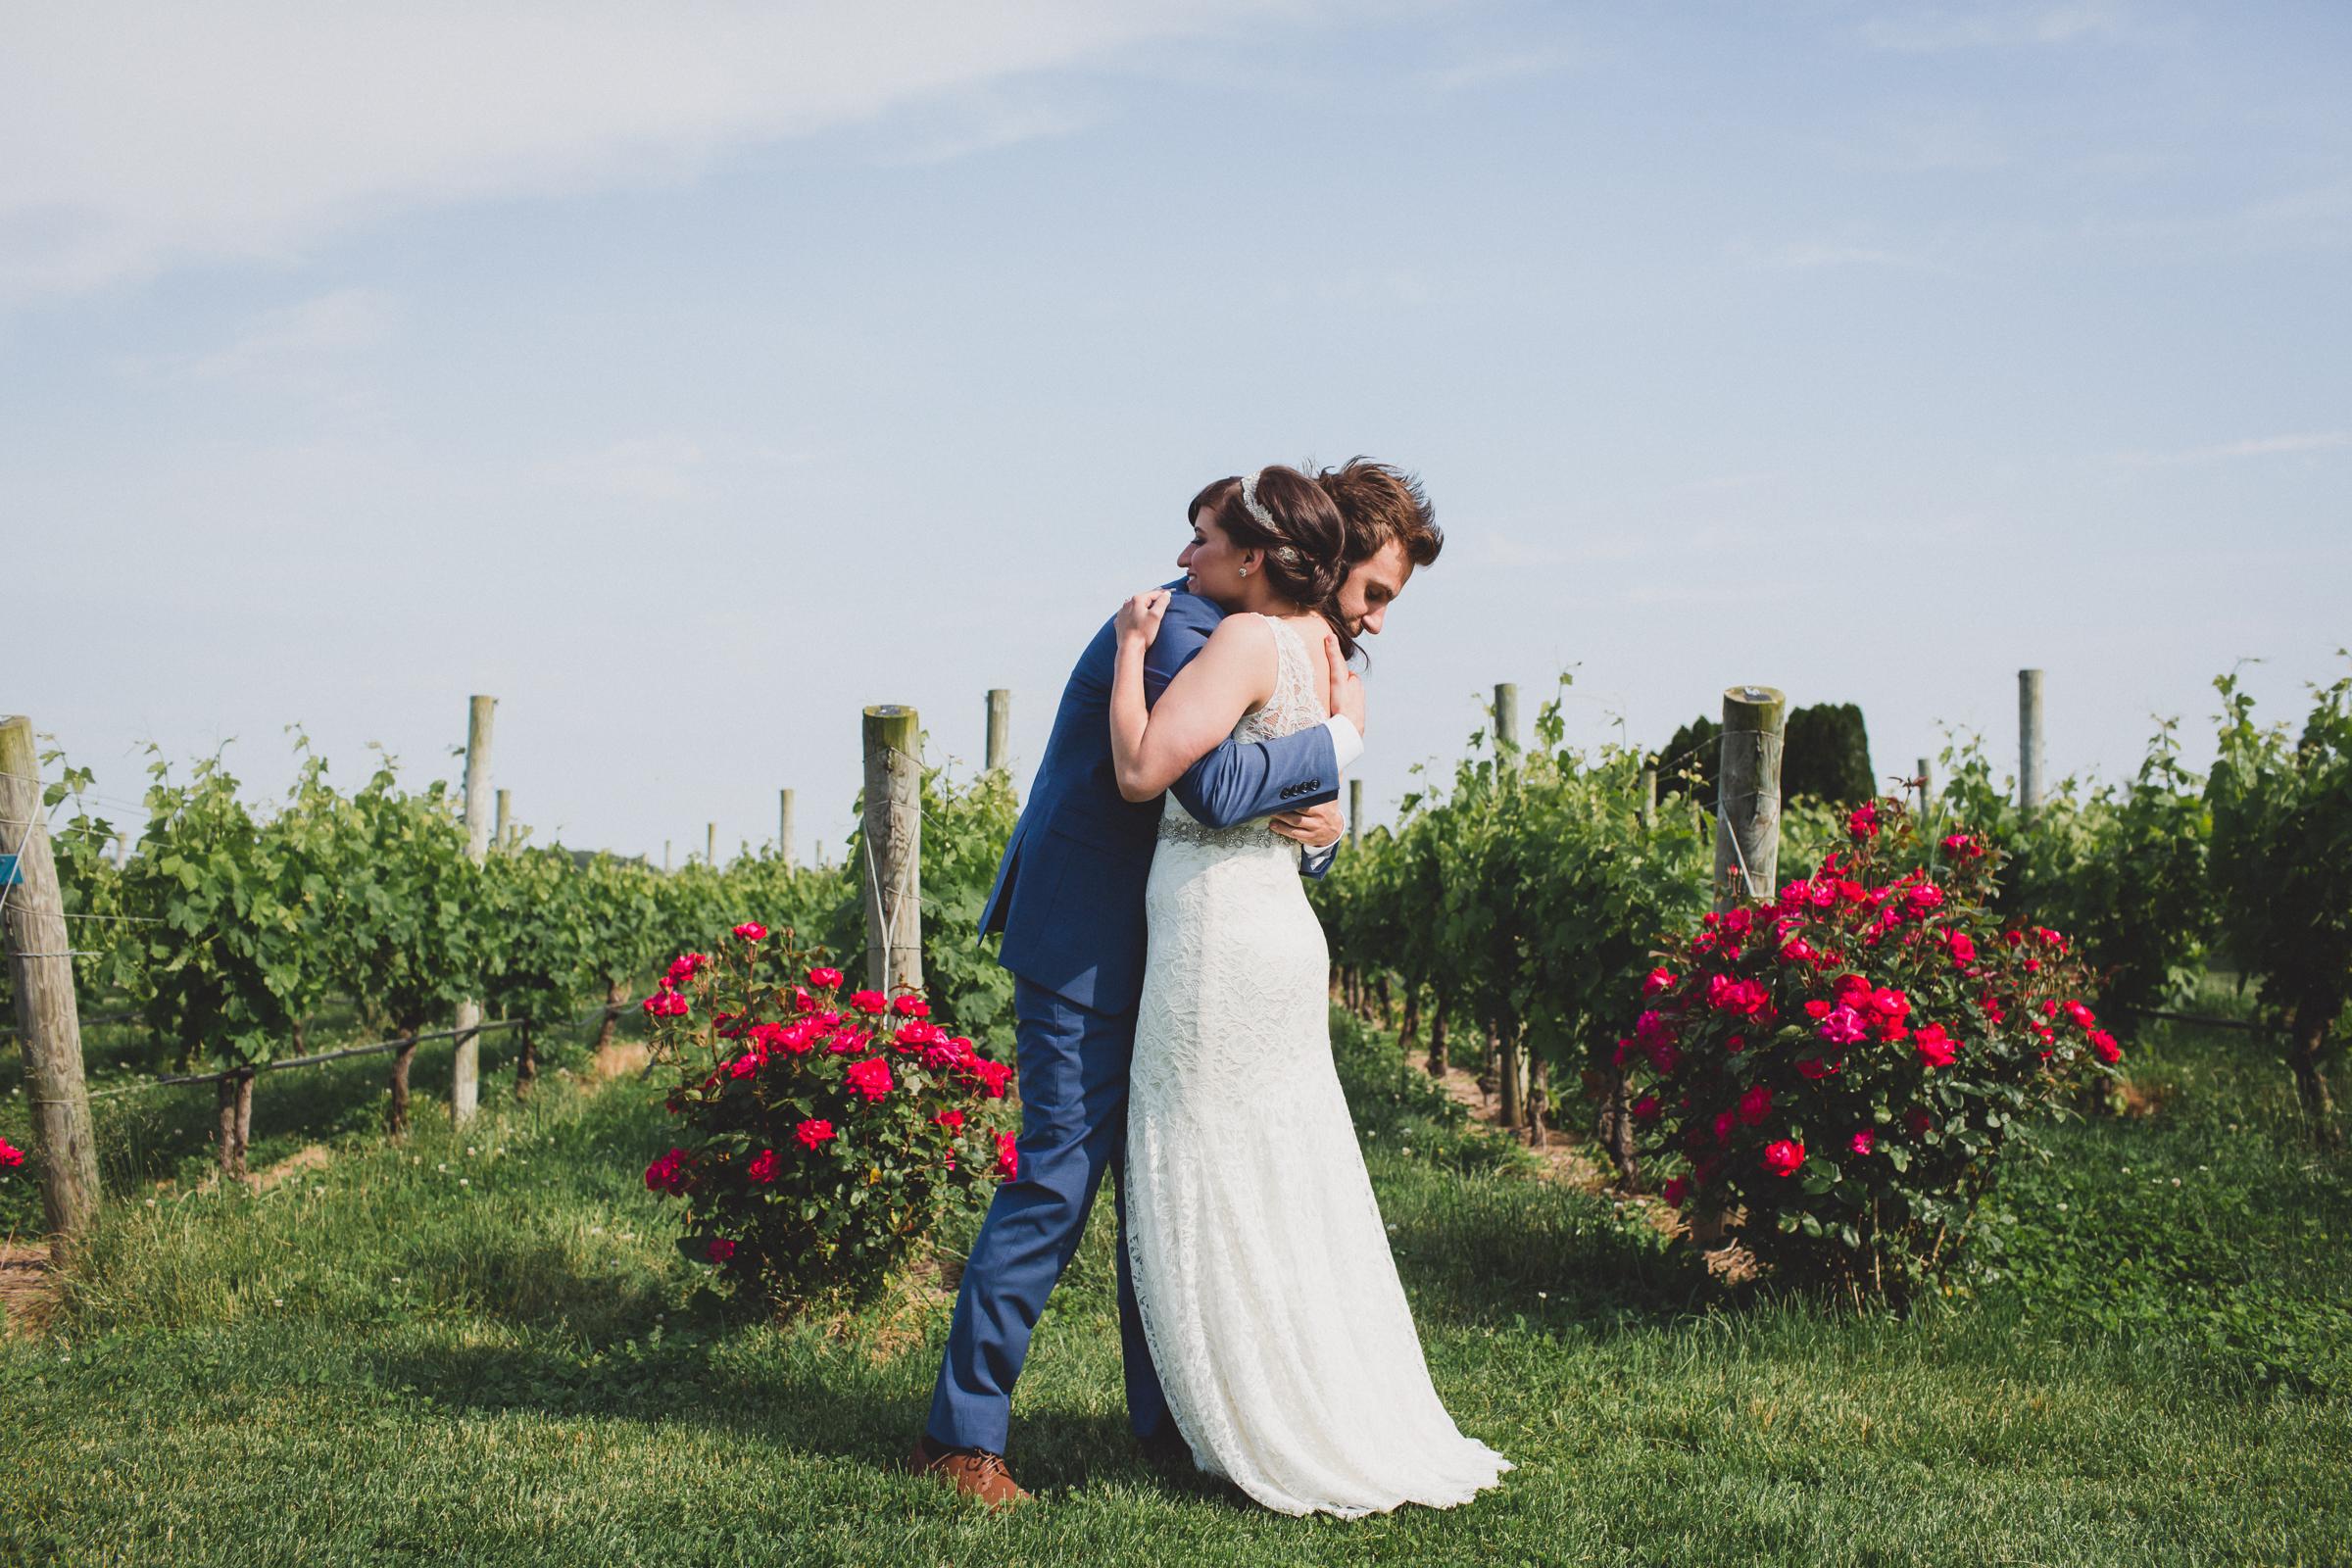 Martha-Clara-Vineyard-Long-Island-Documentary-Wedding-Photographer-28.jpg